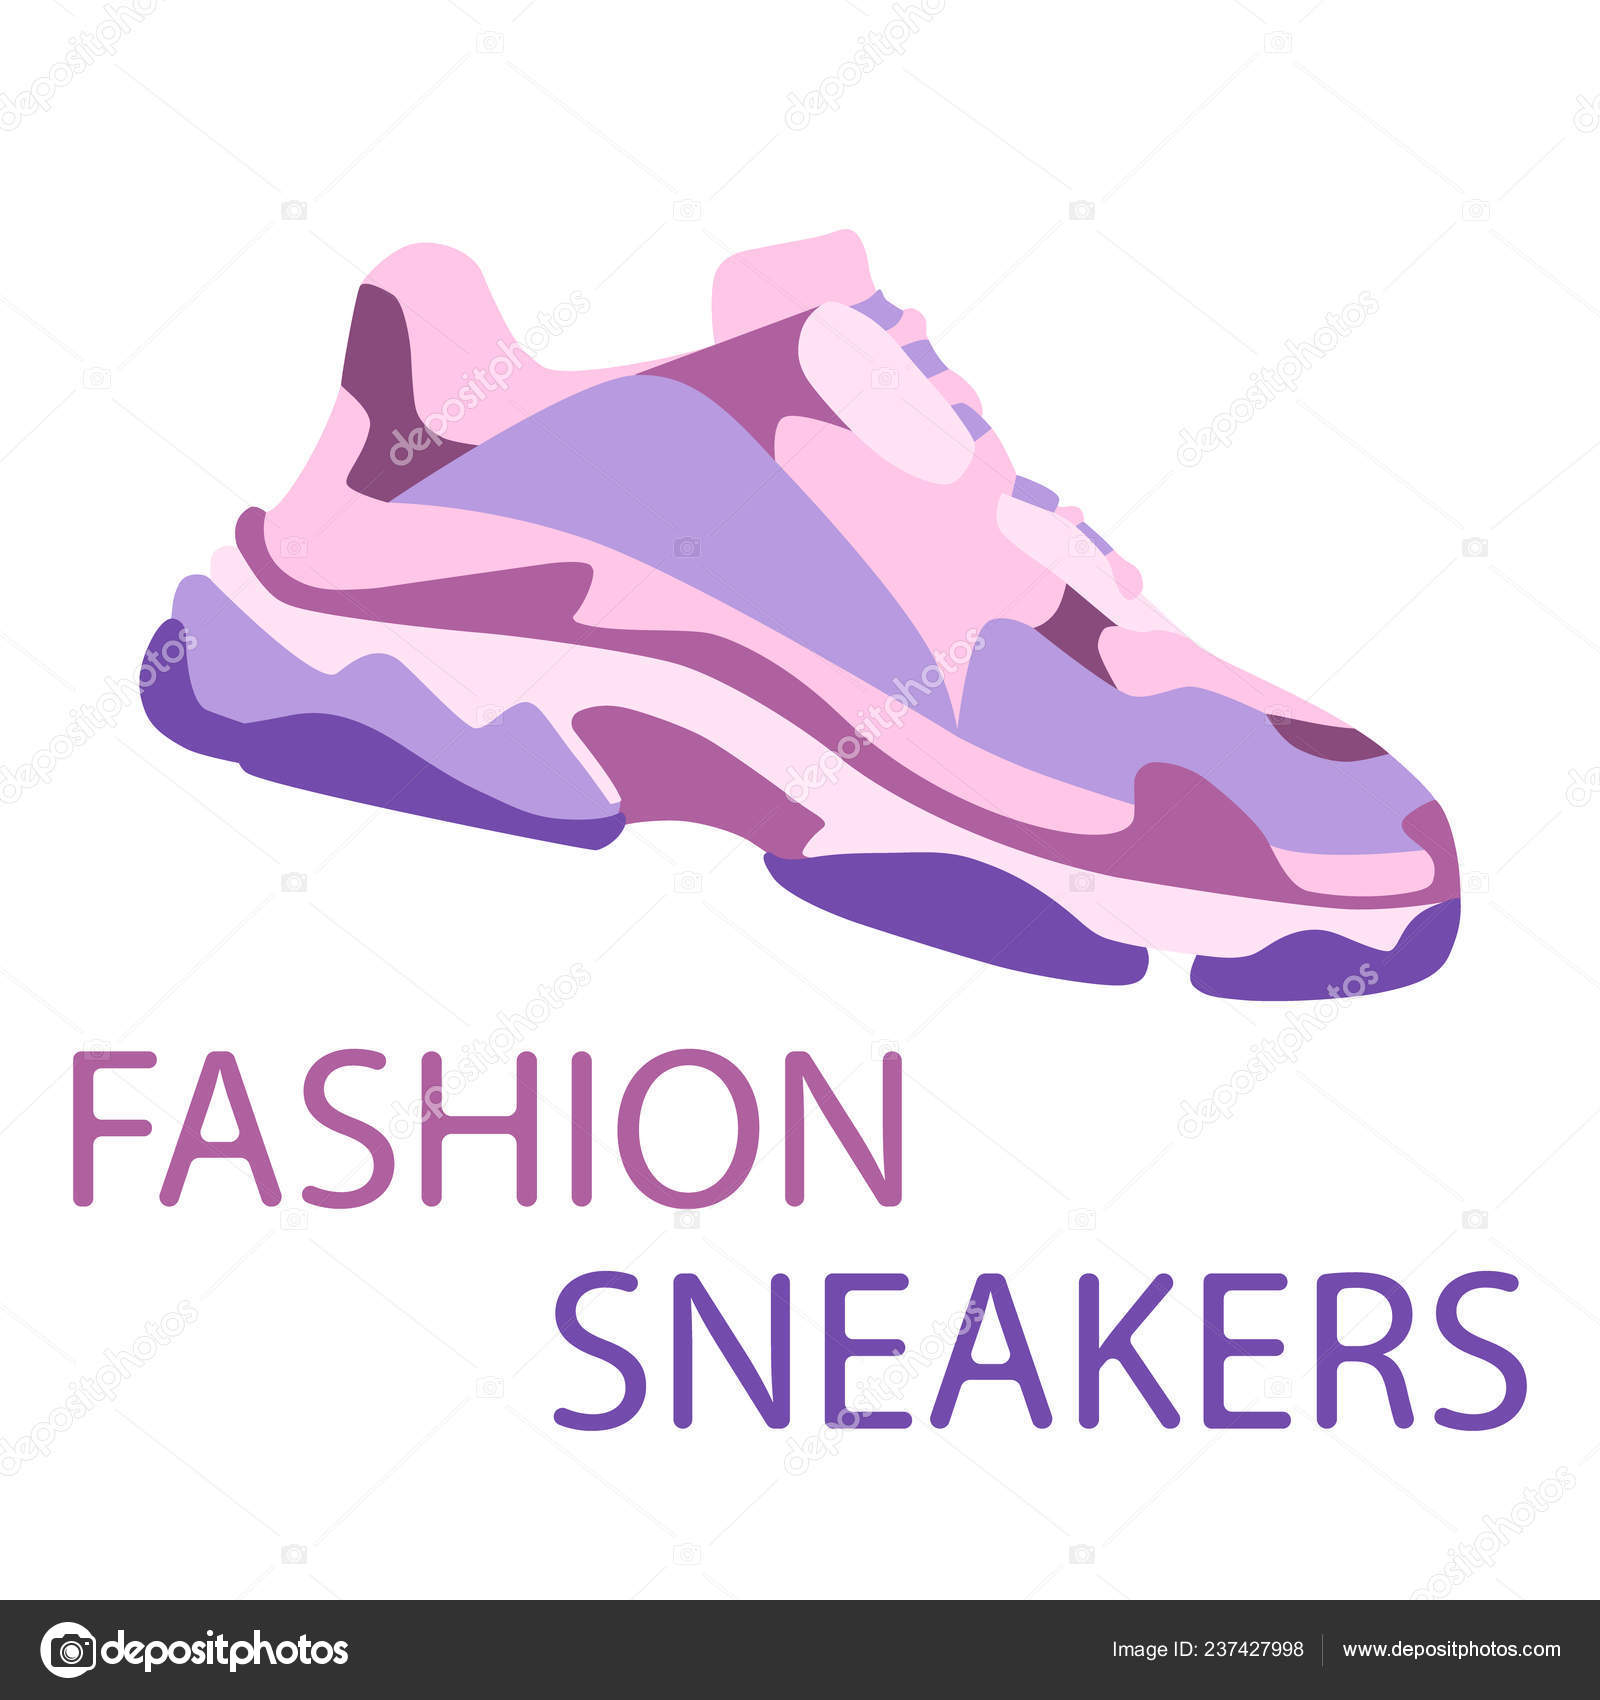 Concepto Vector Plano Ilustración Zapatilla Zapato Deporte Diseño iOukPXZ